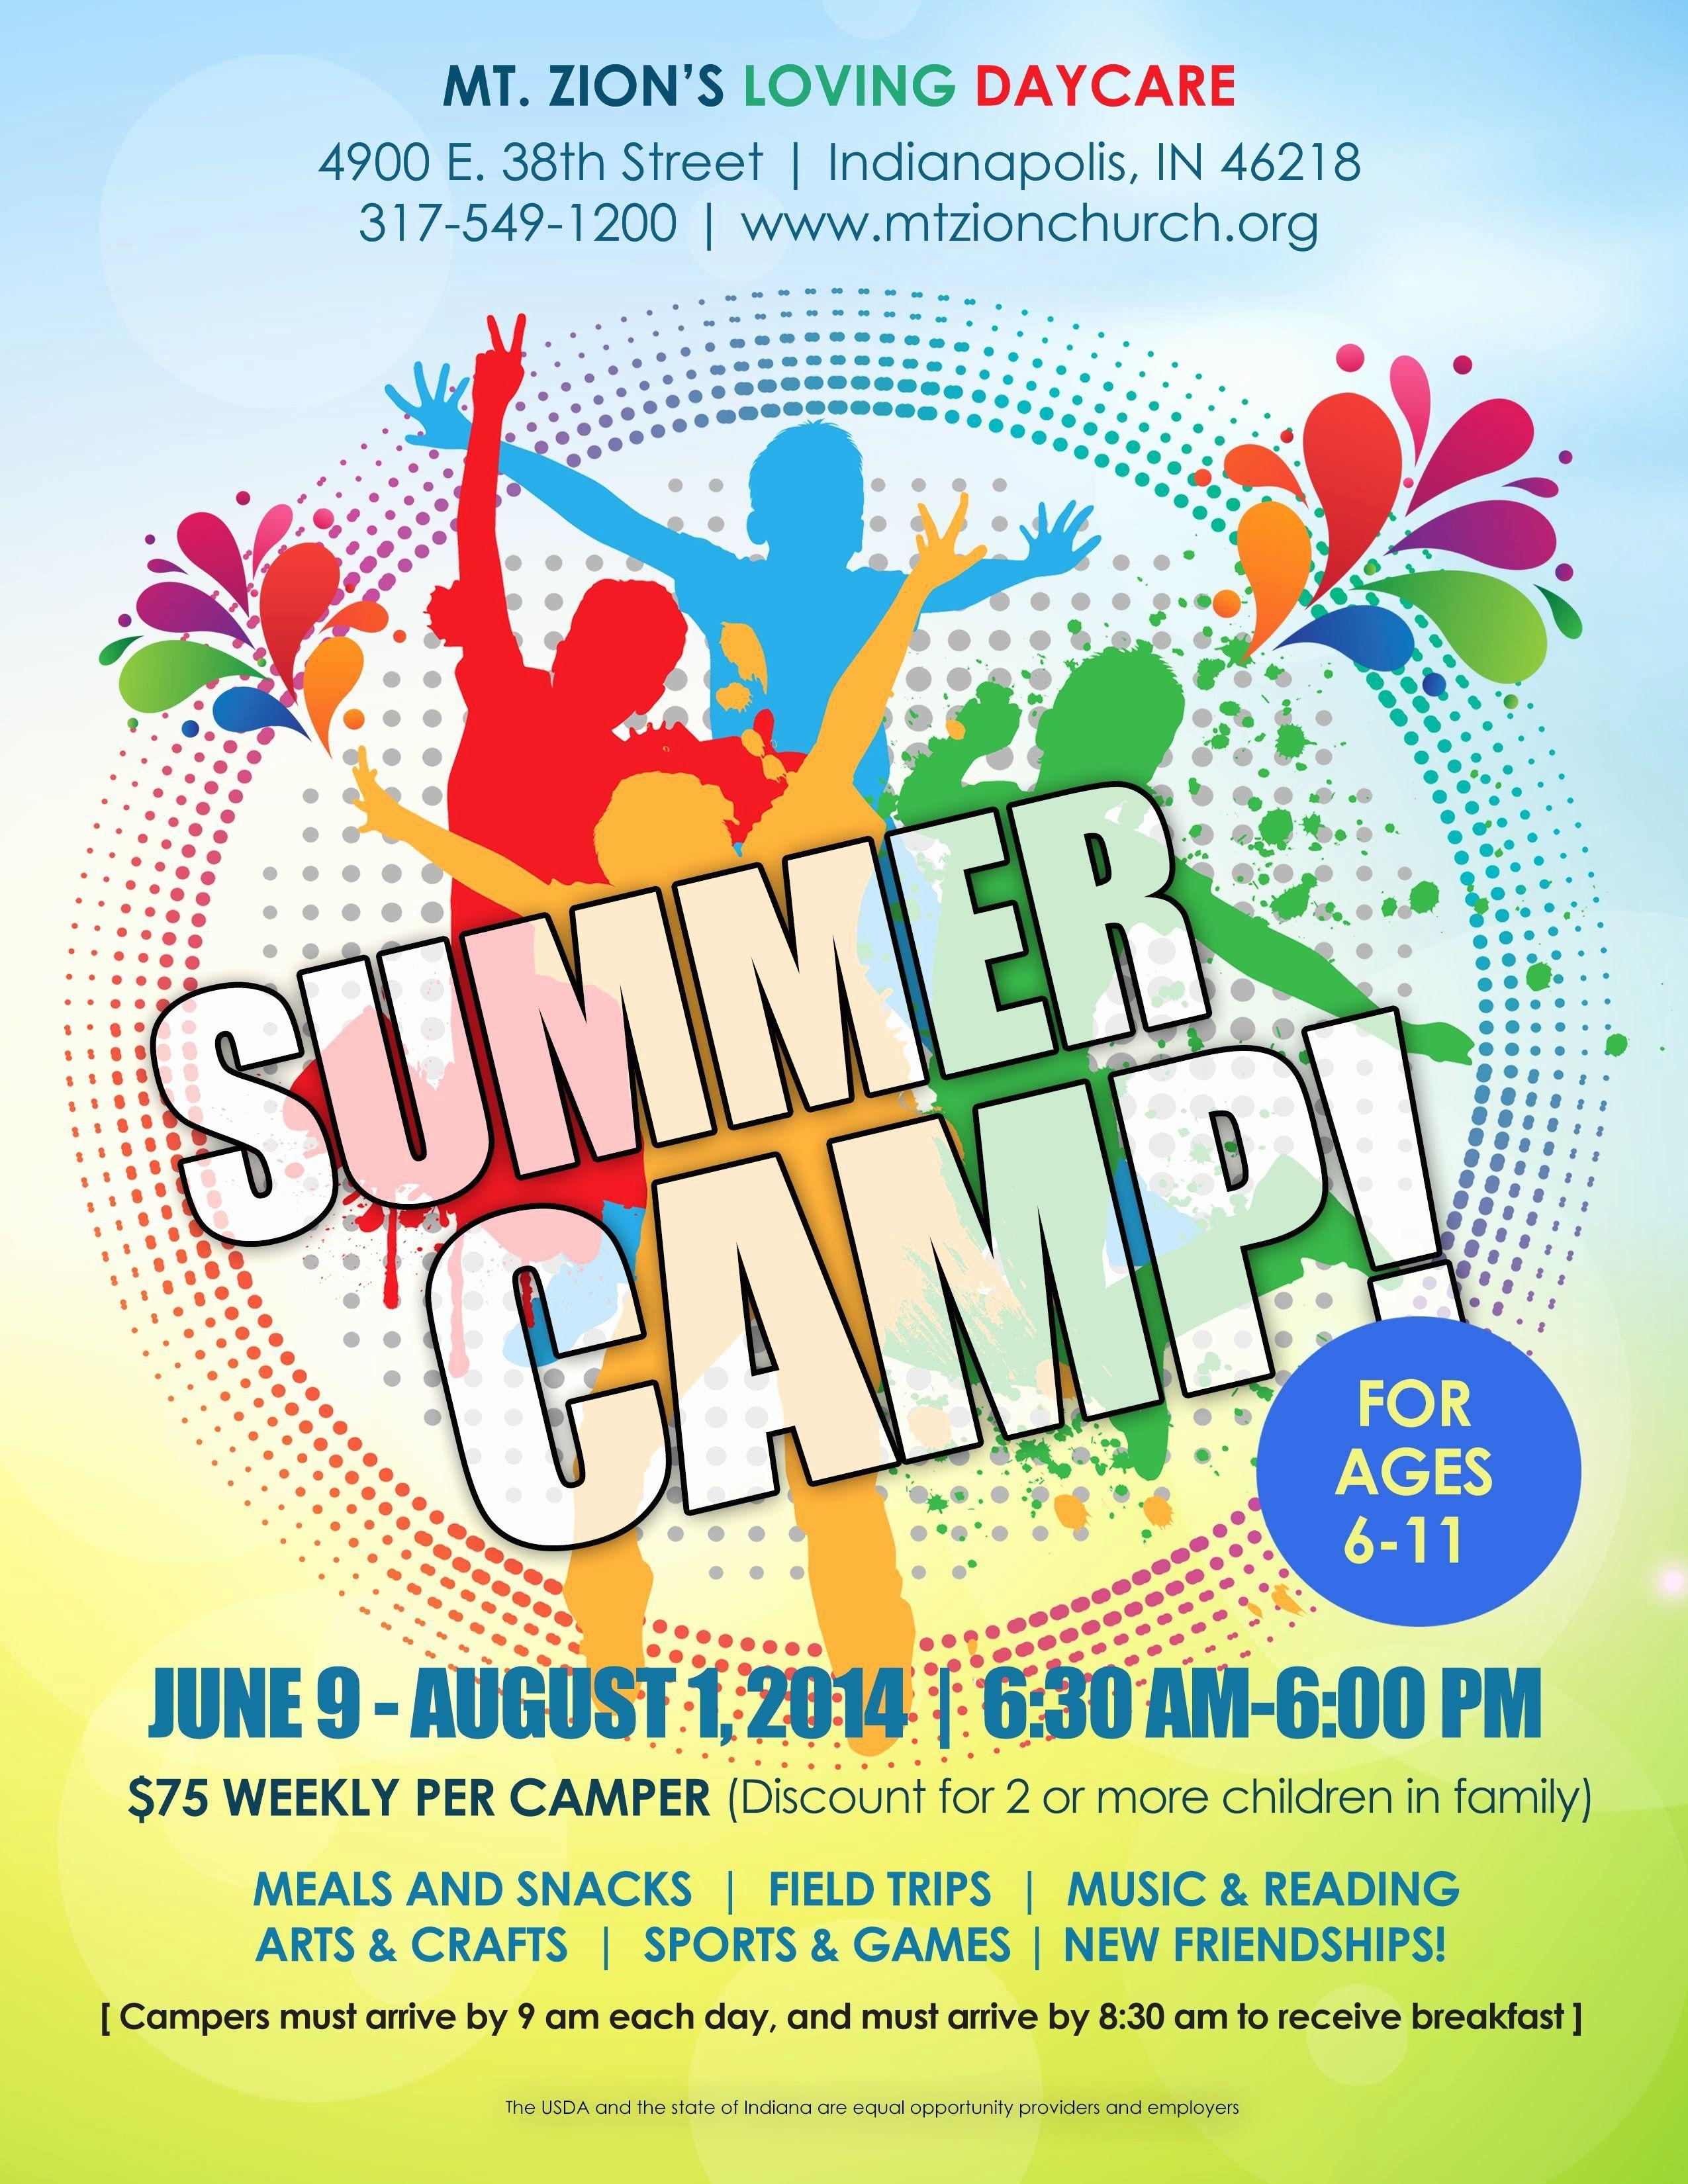 Free Summer Camp Flyer Template Fresh Summer Camp Flyer Idea Kid Min Pinterest Free Brochure Template Brochure Summer Camps For Kids Free summer camp flyer template